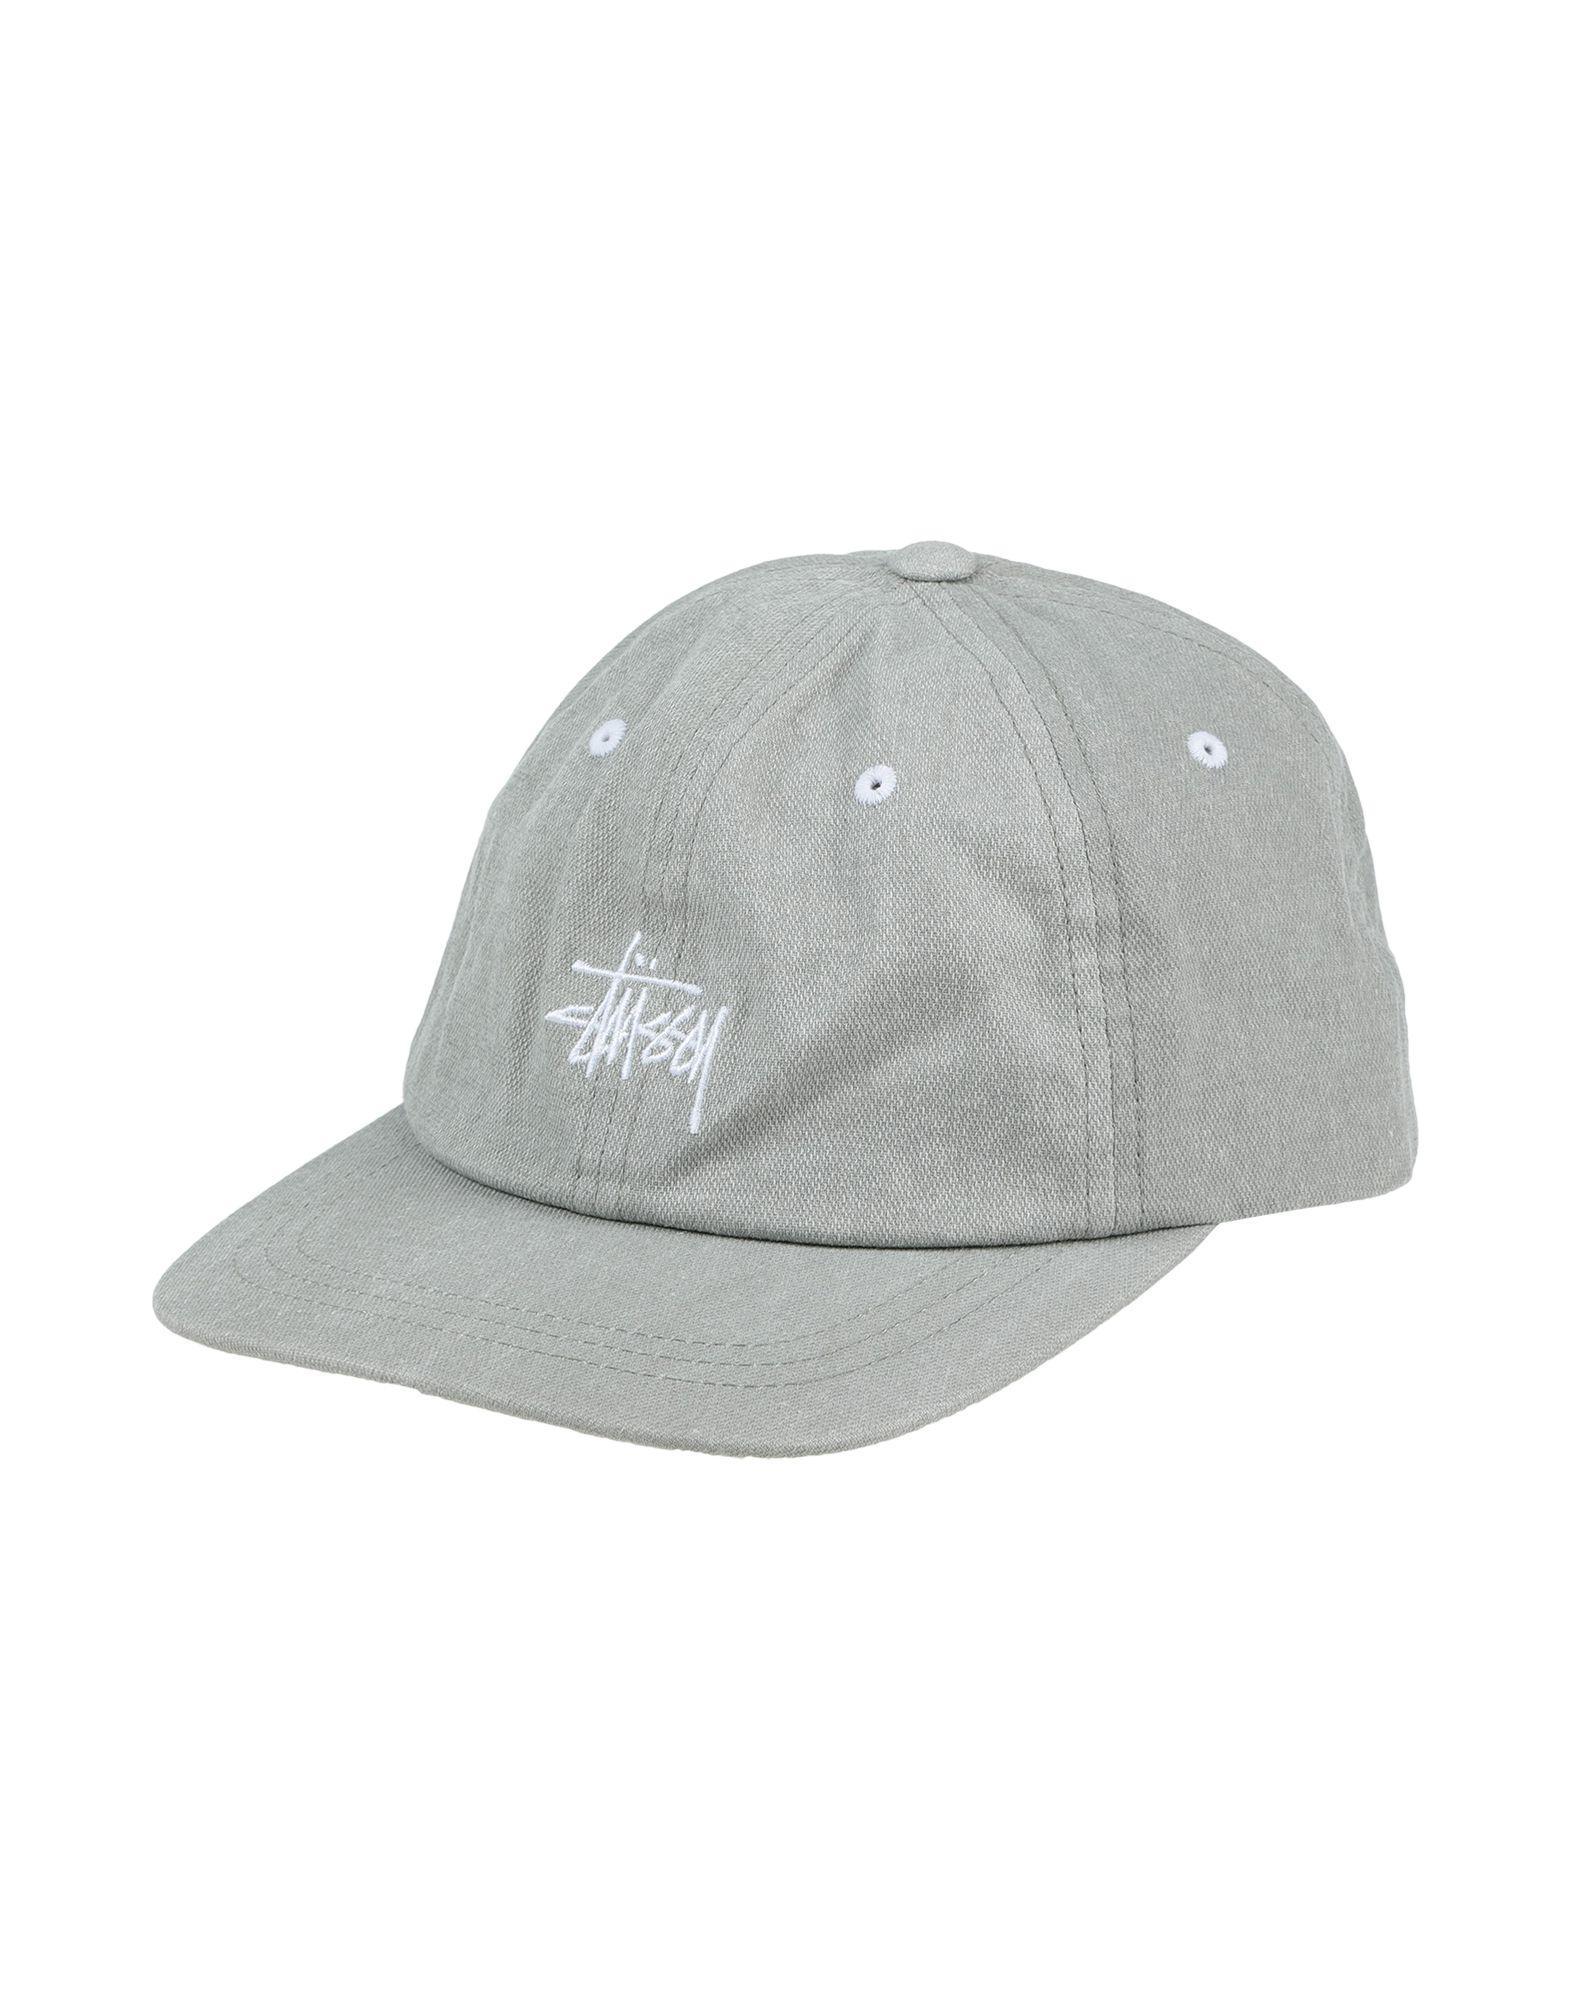 e2ffbb67c5b Stussy Hat in Green for Men - Lyst